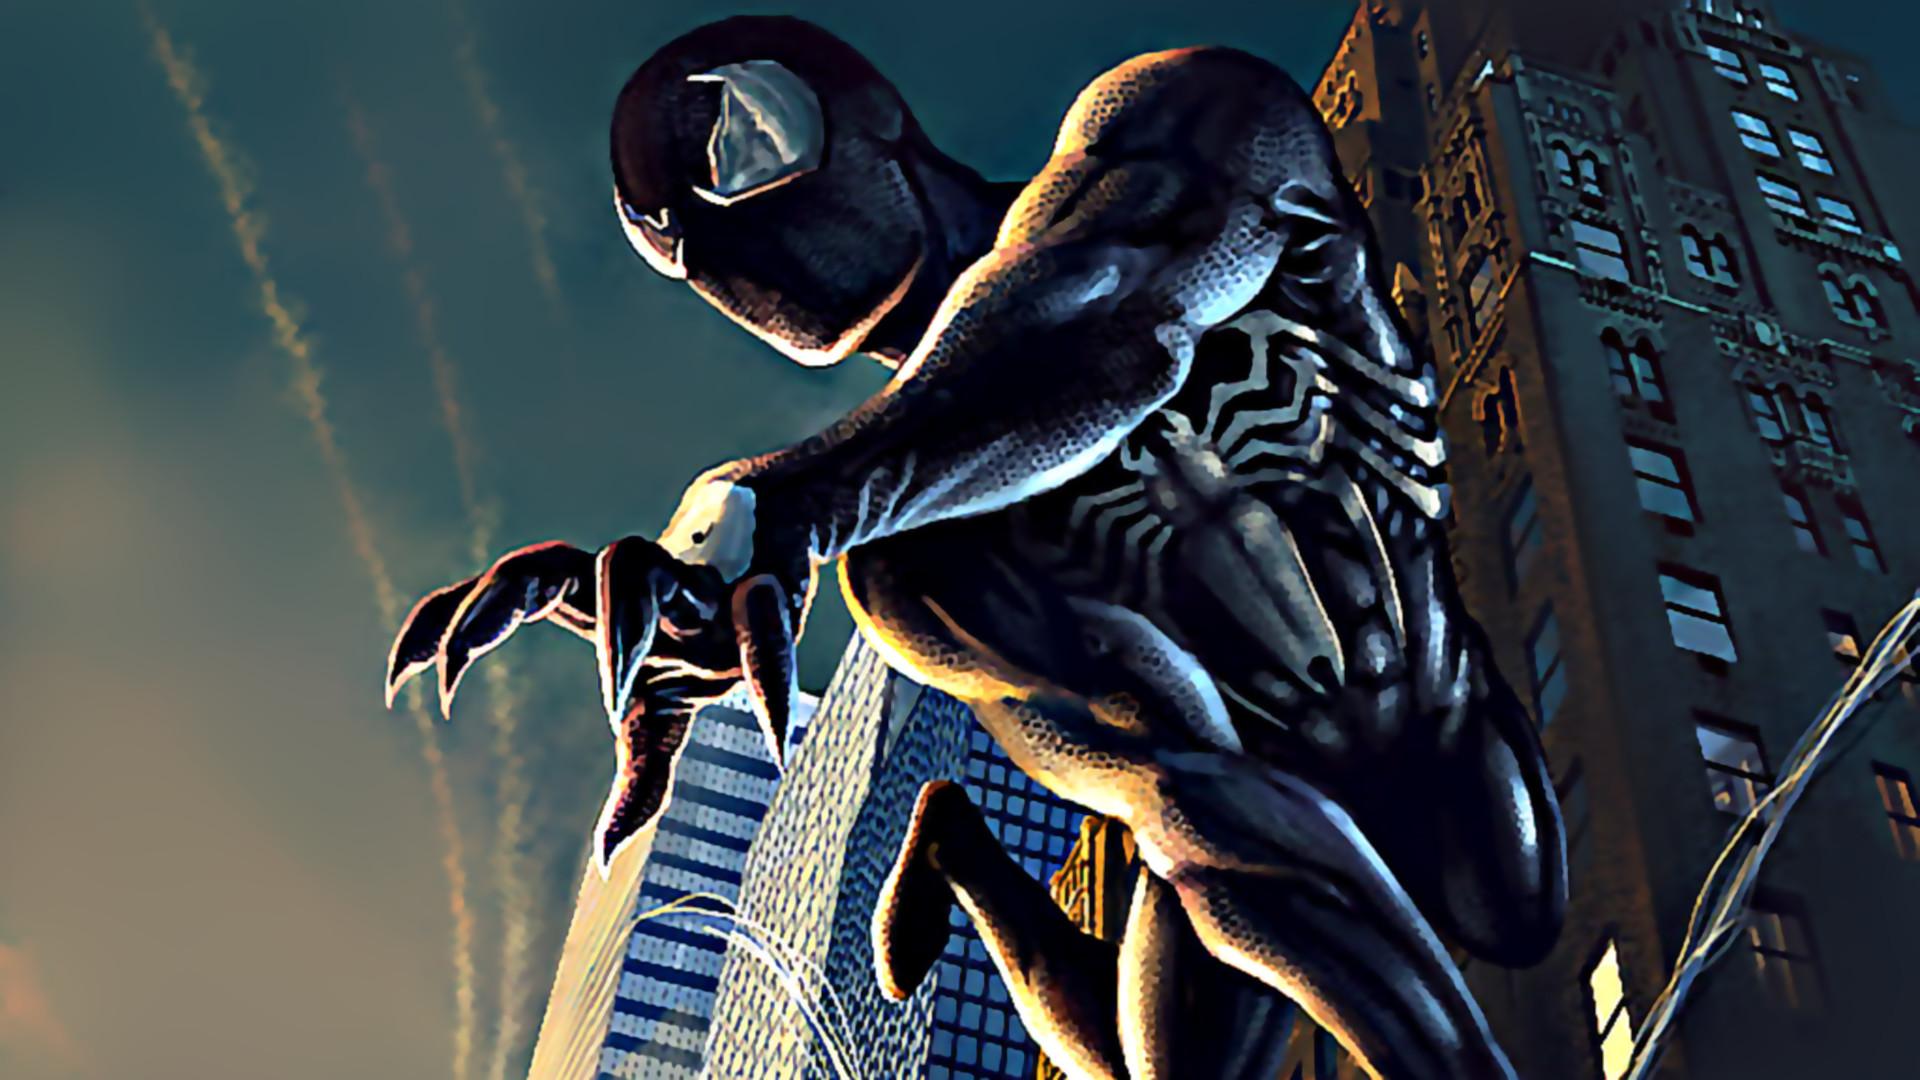 Venom Wallpapers Pictures Images: Spiderman Venom Wallpaper (59+ Images